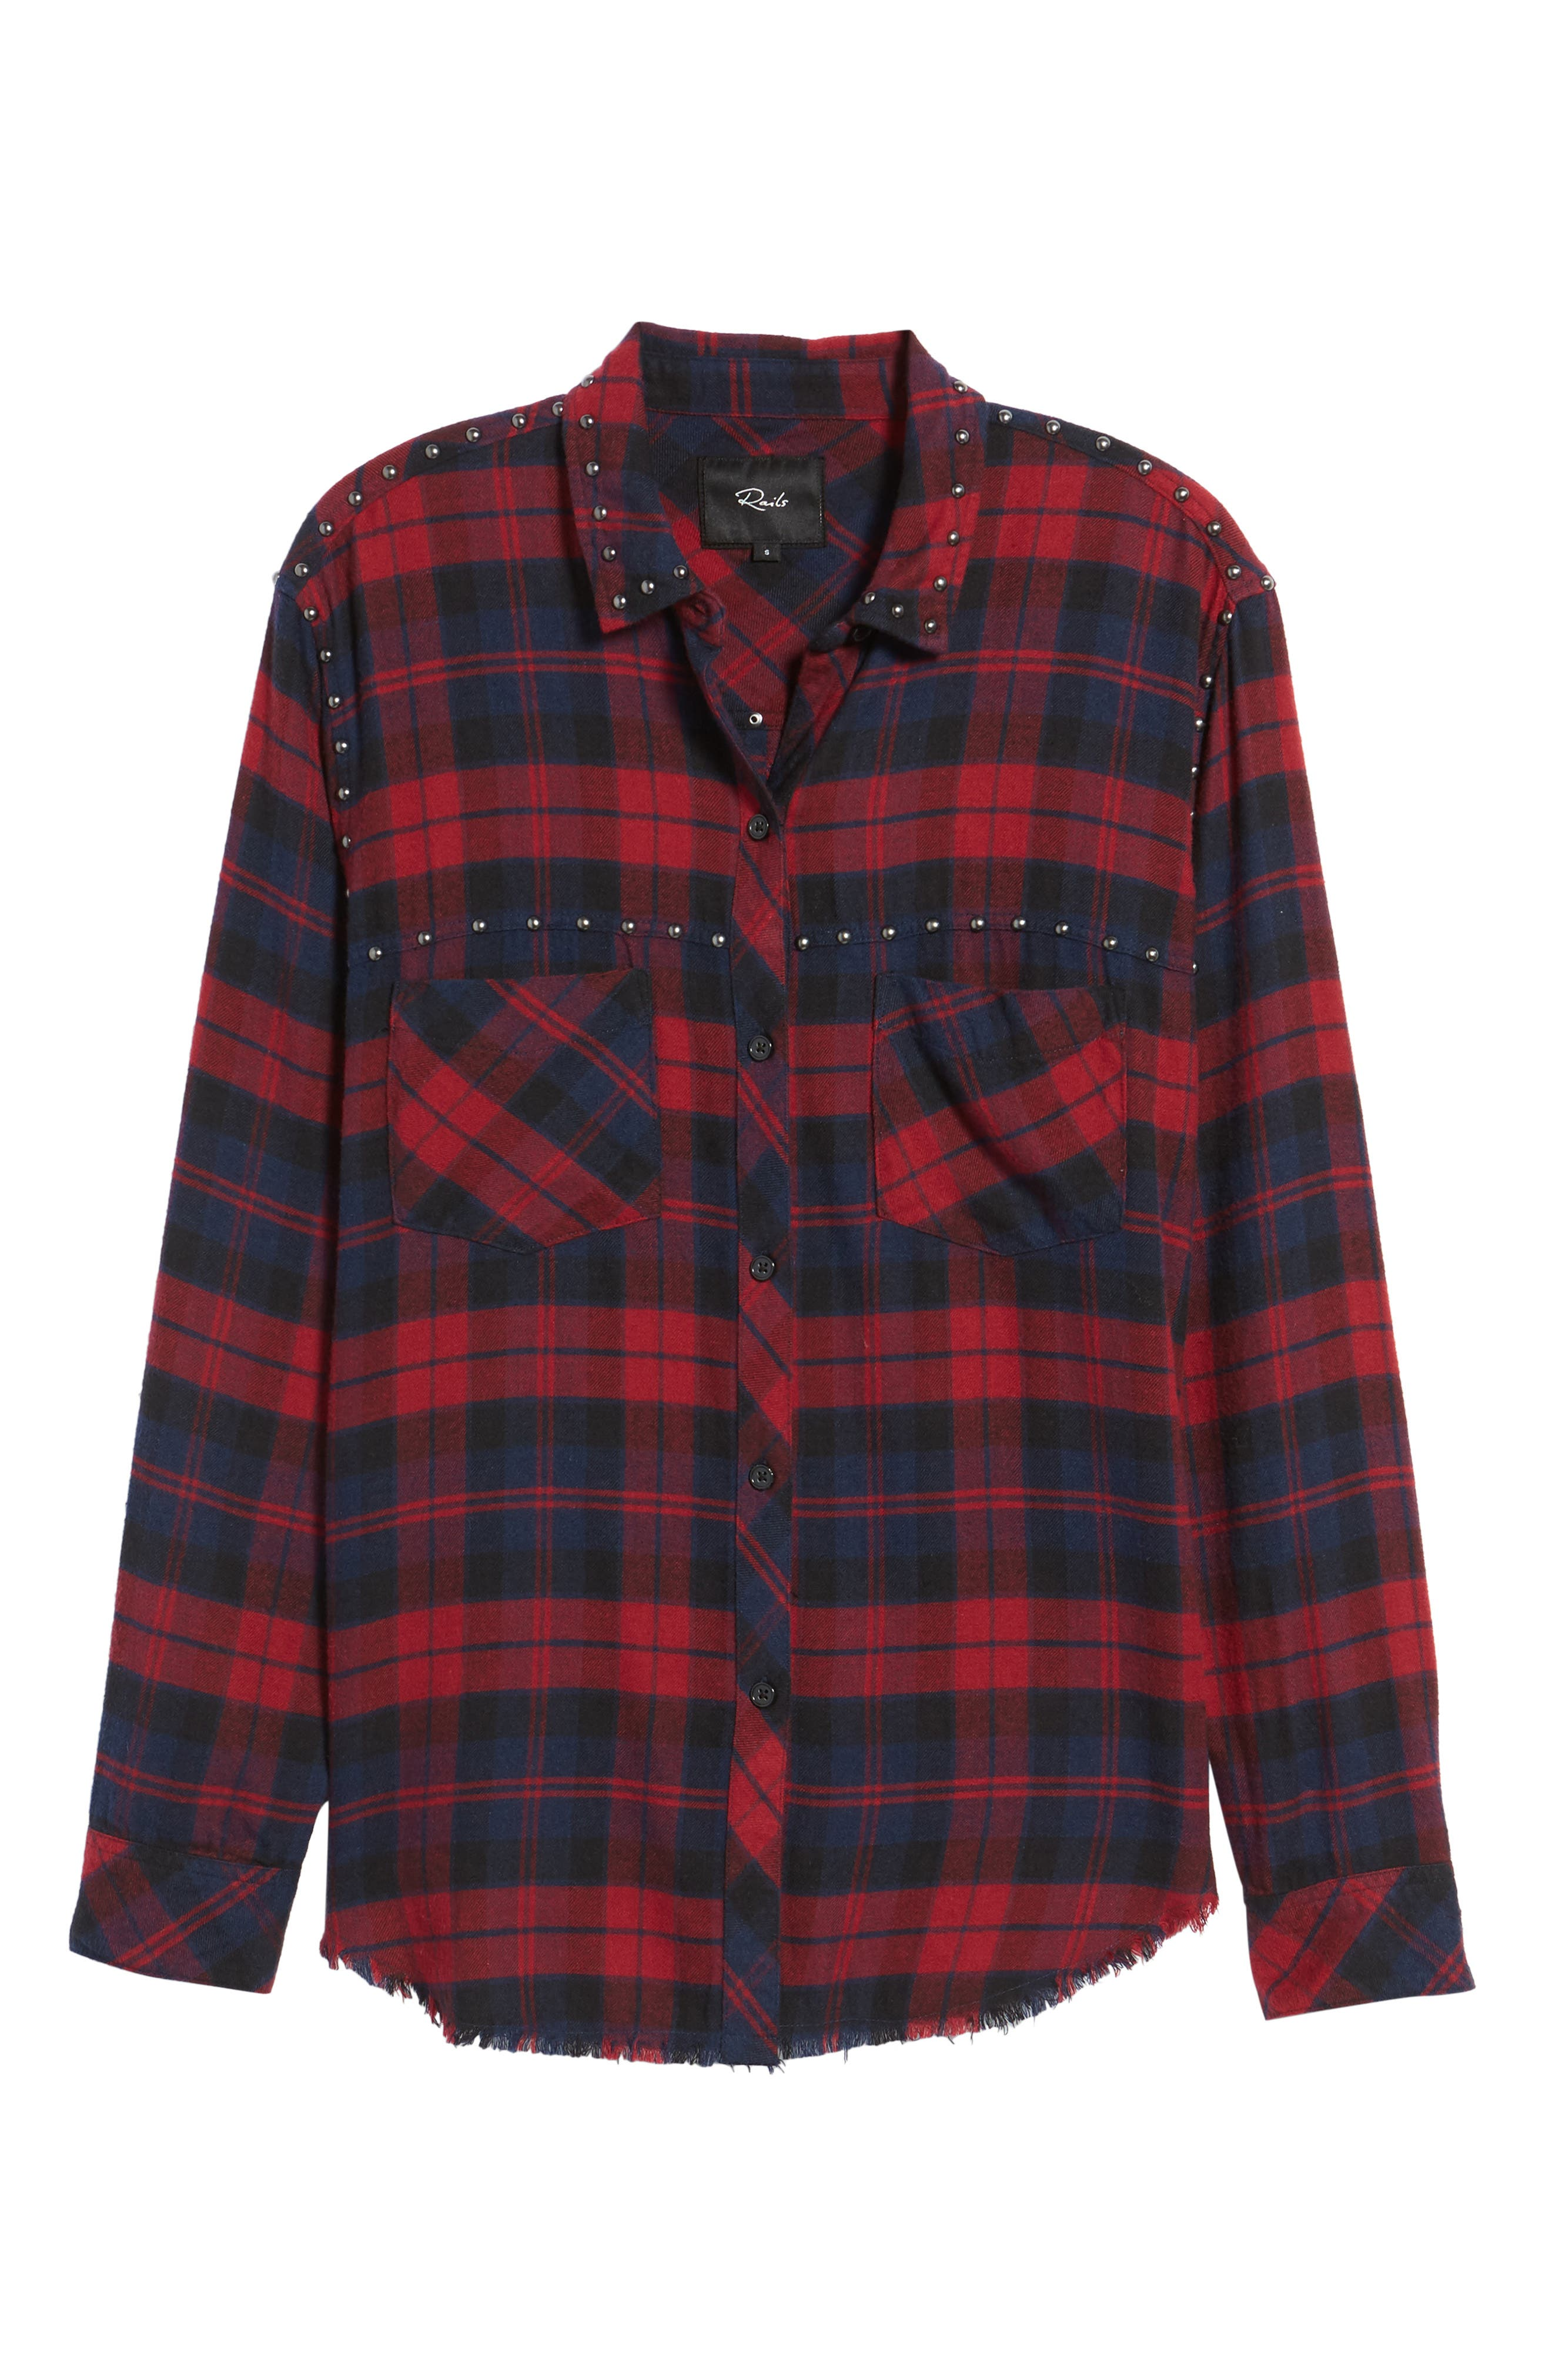 Rex Studded Plaid Shirt,                             Alternate thumbnail 6, color,                             622